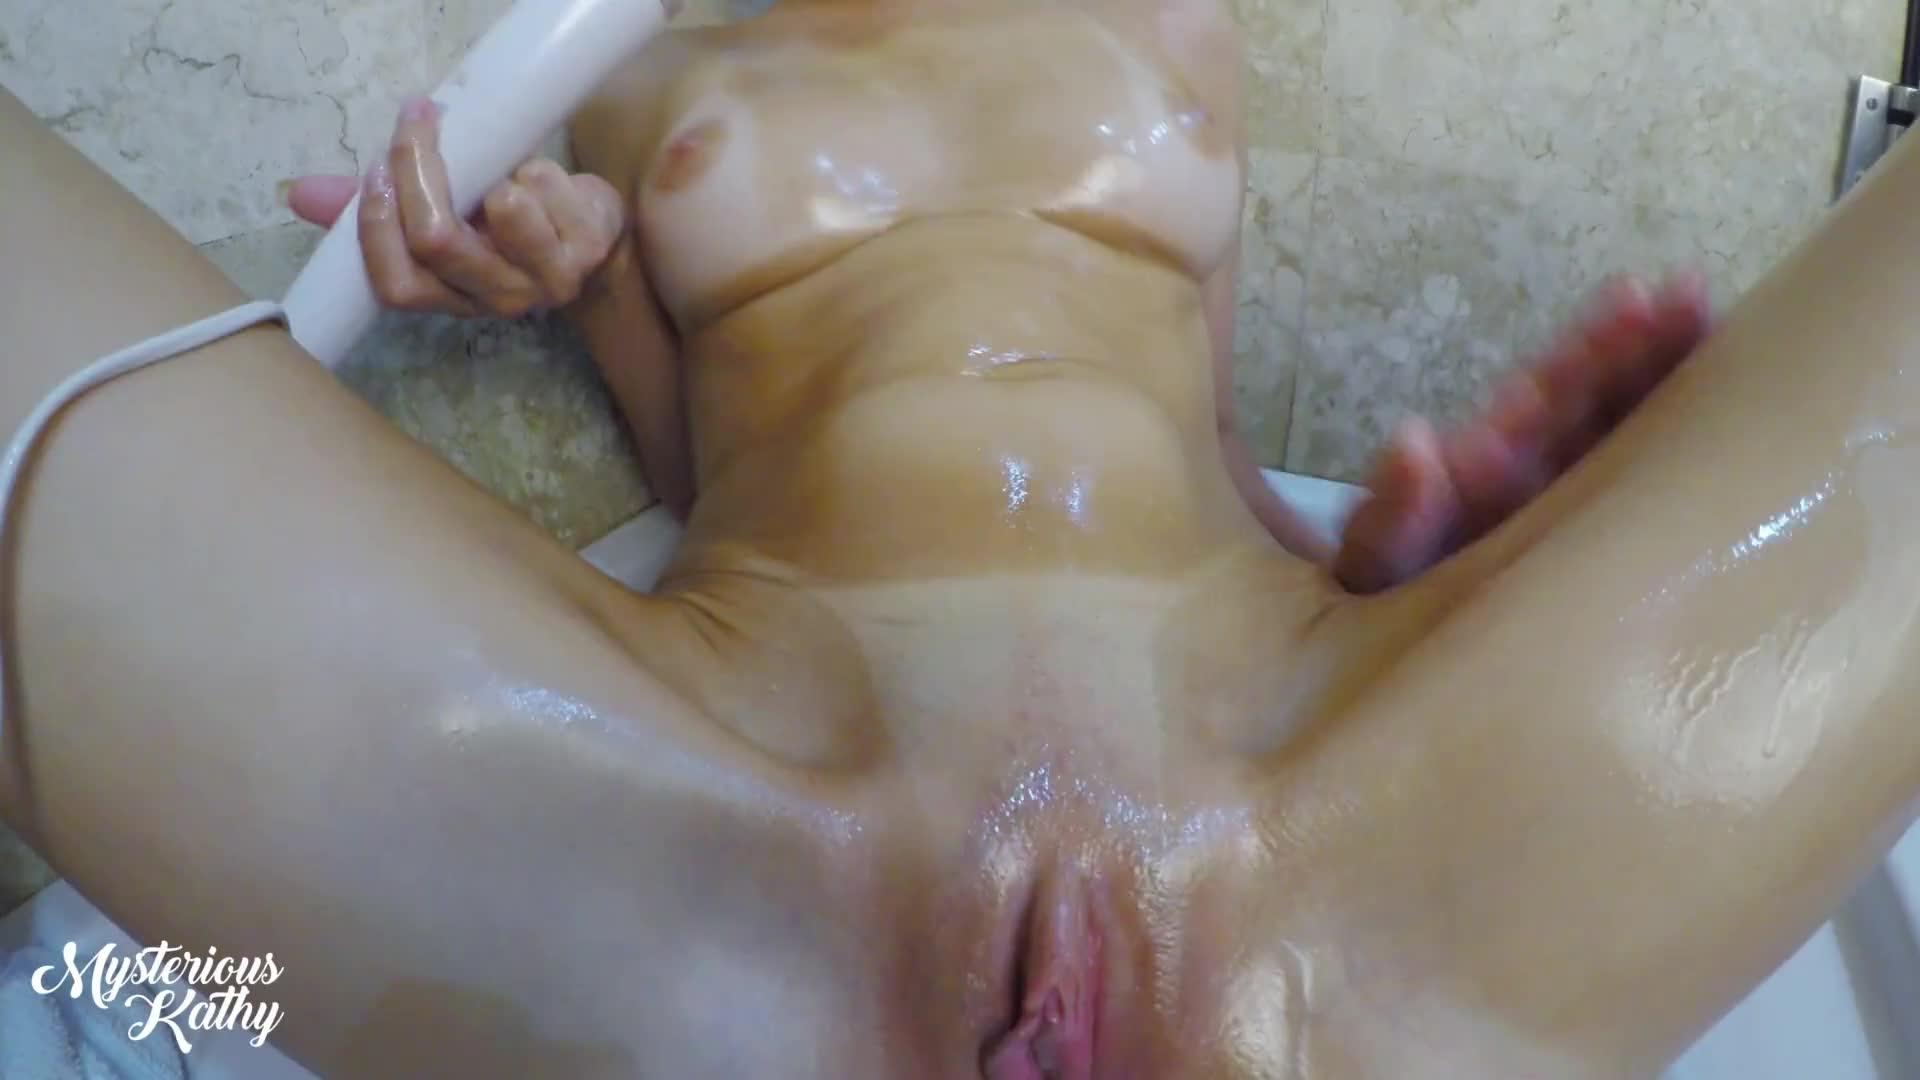 sexy amateur pornos online